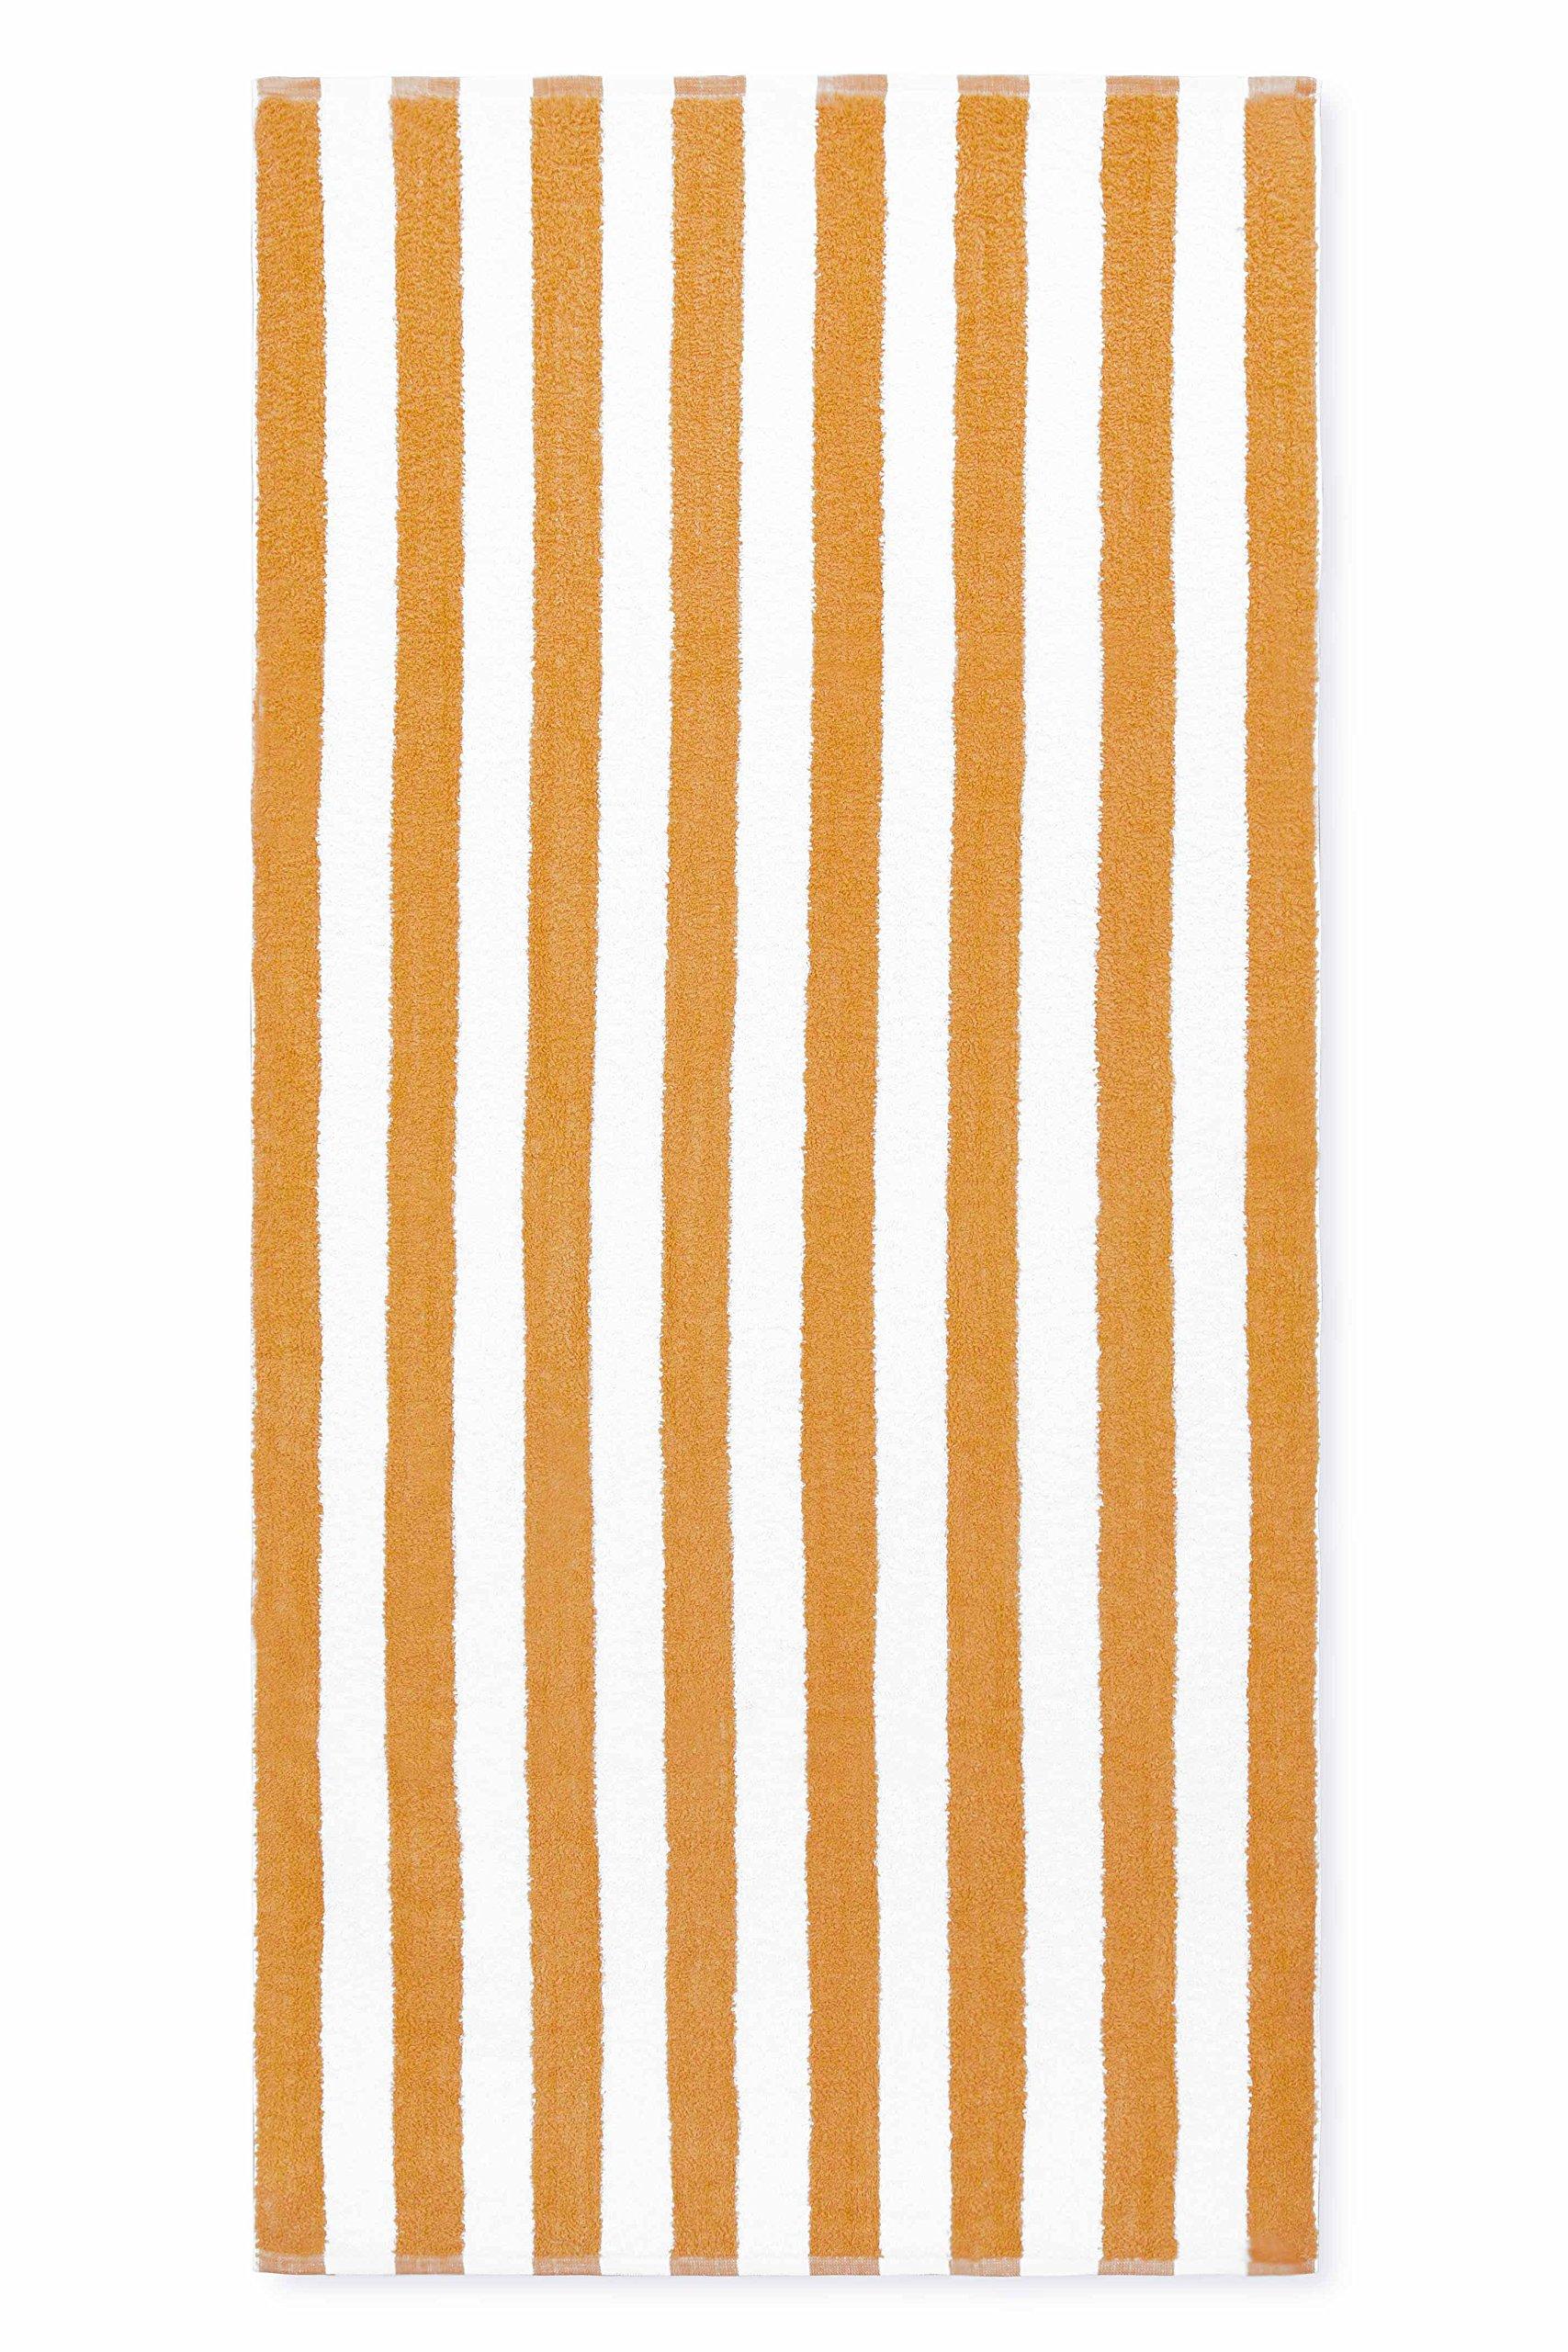 Cabana Stripe Towel - full length